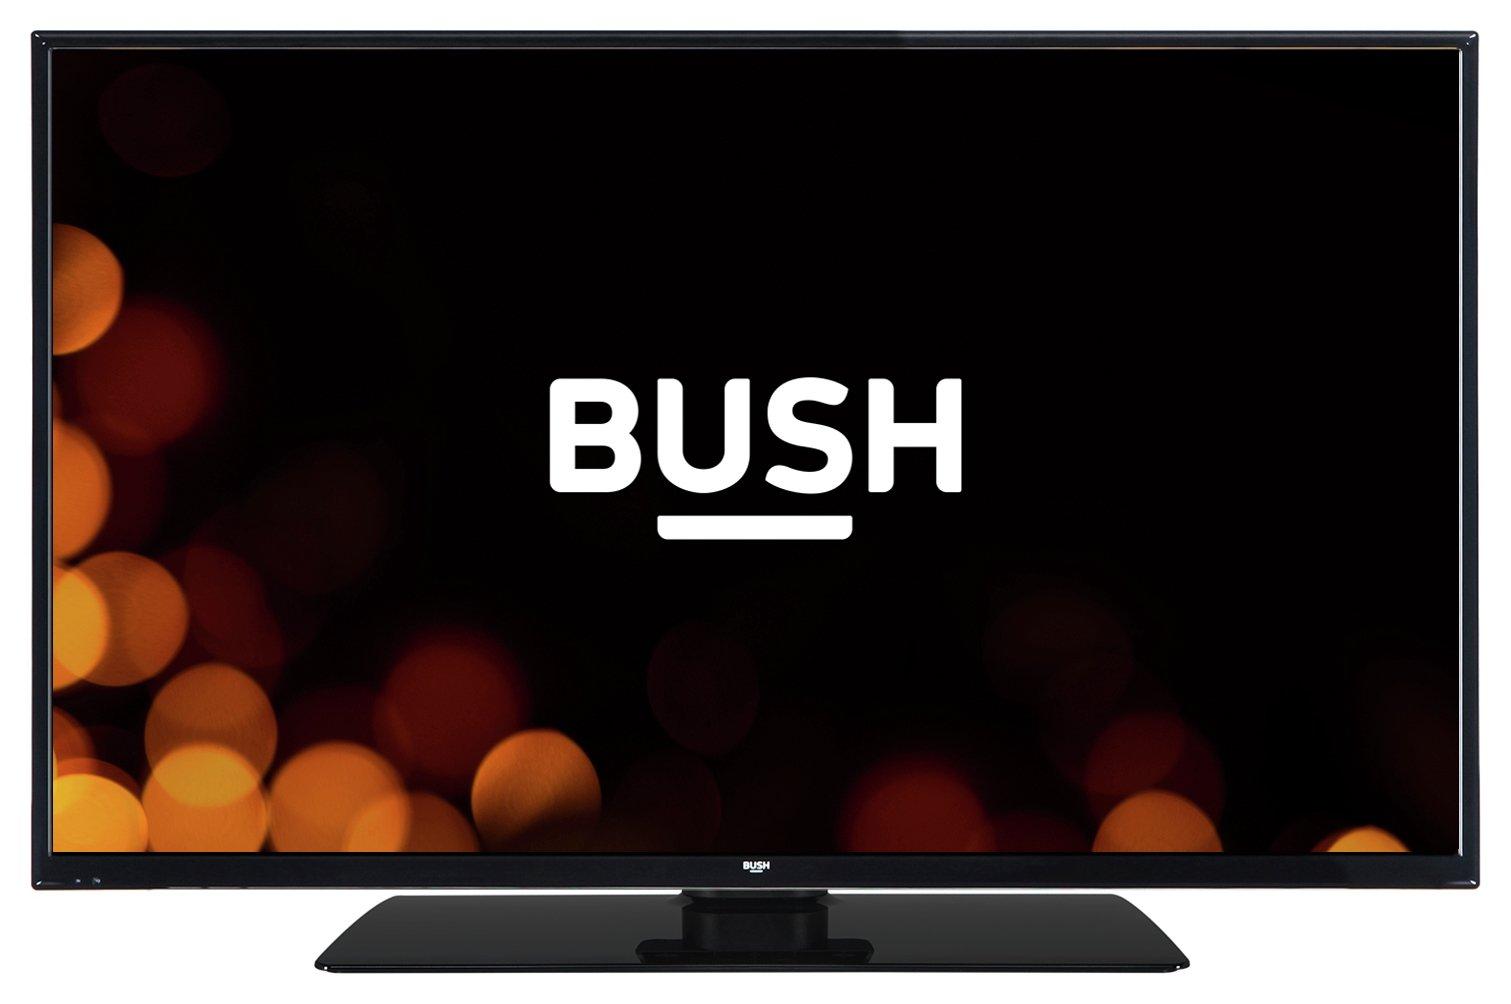 'Bush 48 Inch Full Hd Led Tv.